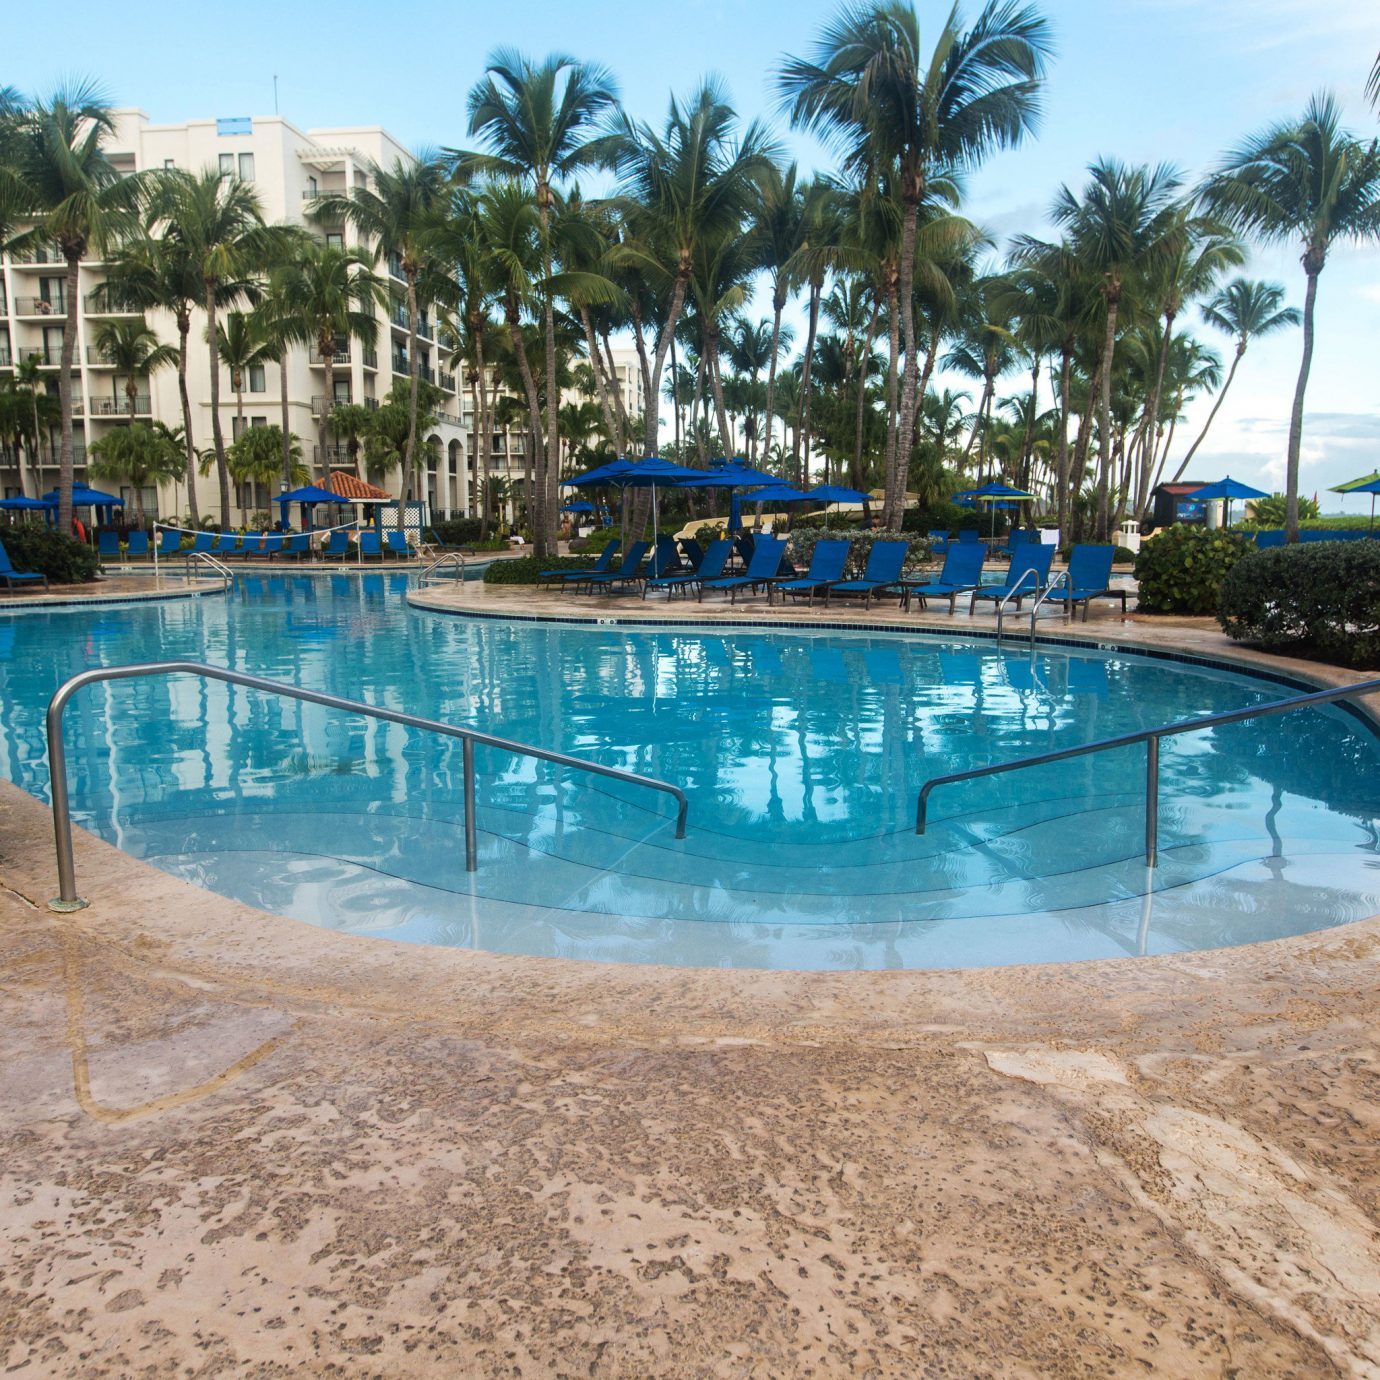 tree sky ground swimming pool property Resort Pool resort town blue backyard Villa Water park swimming